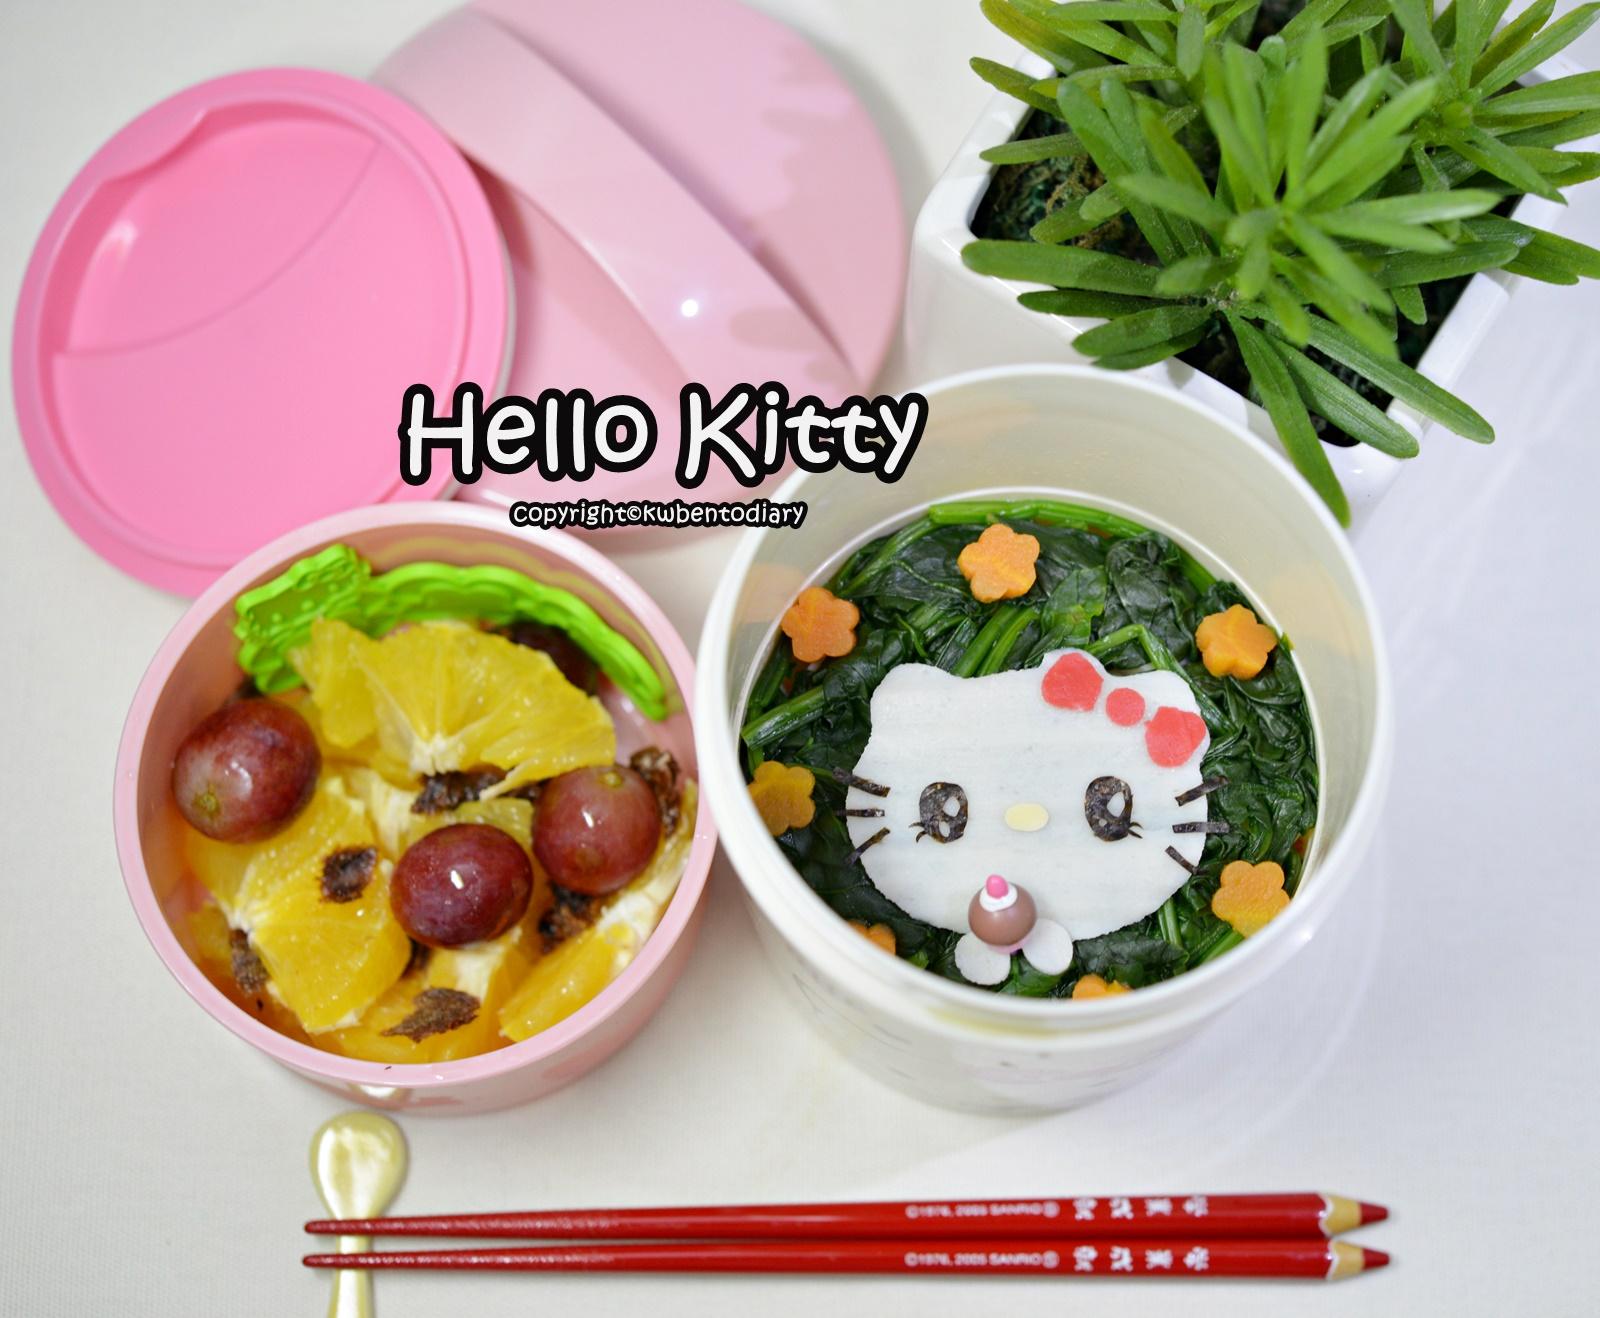 karenwee 39 s bento diary bento2015 nov03 hello kitty lunch box. Black Bedroom Furniture Sets. Home Design Ideas